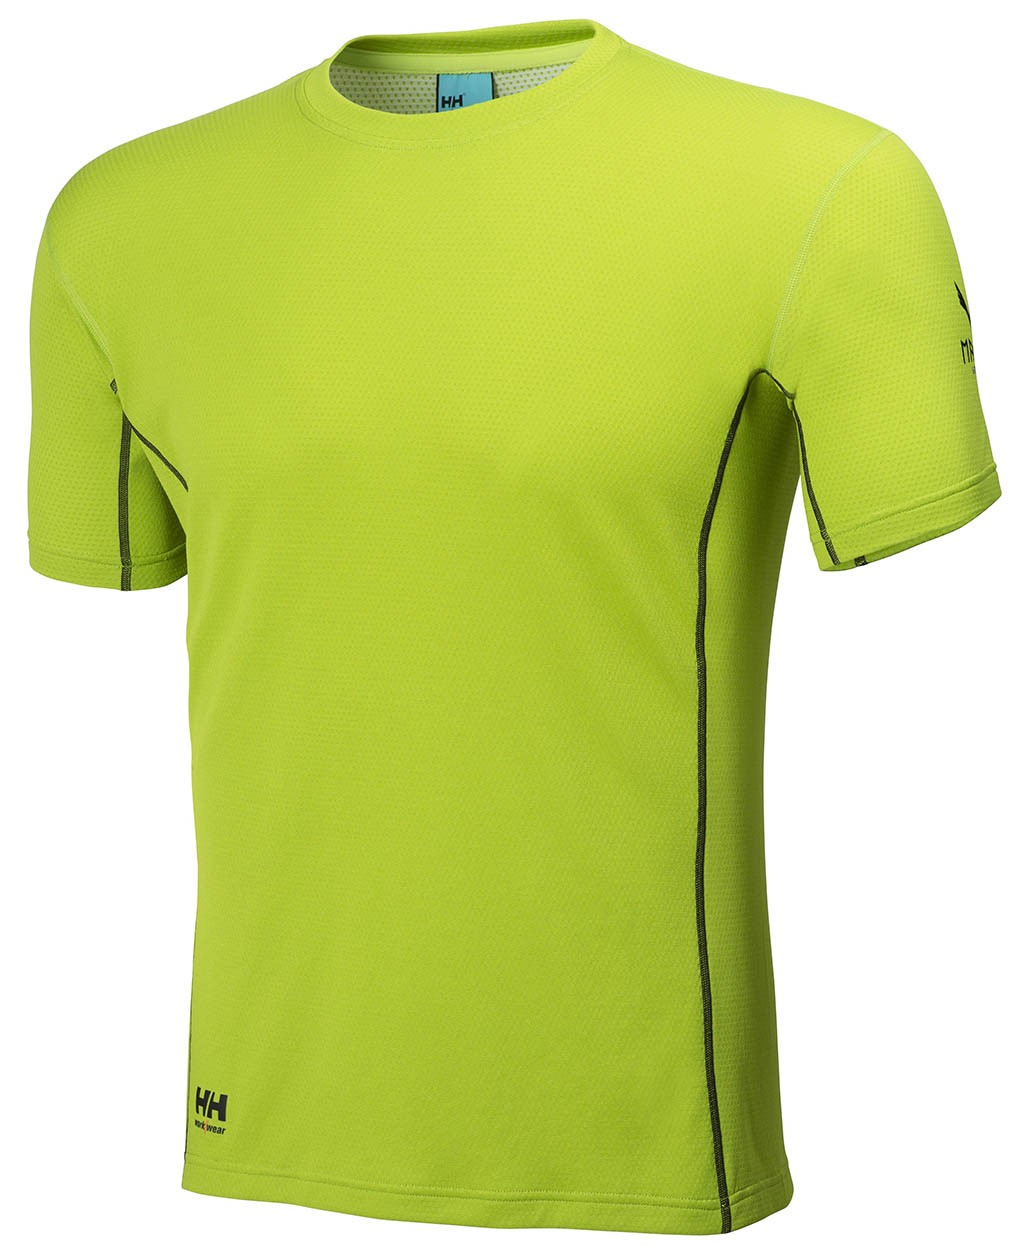 2a47eb73f41f Helly Hansen 75161 Magni T-Shirt - Workwear Polo Shirts   Tees ...